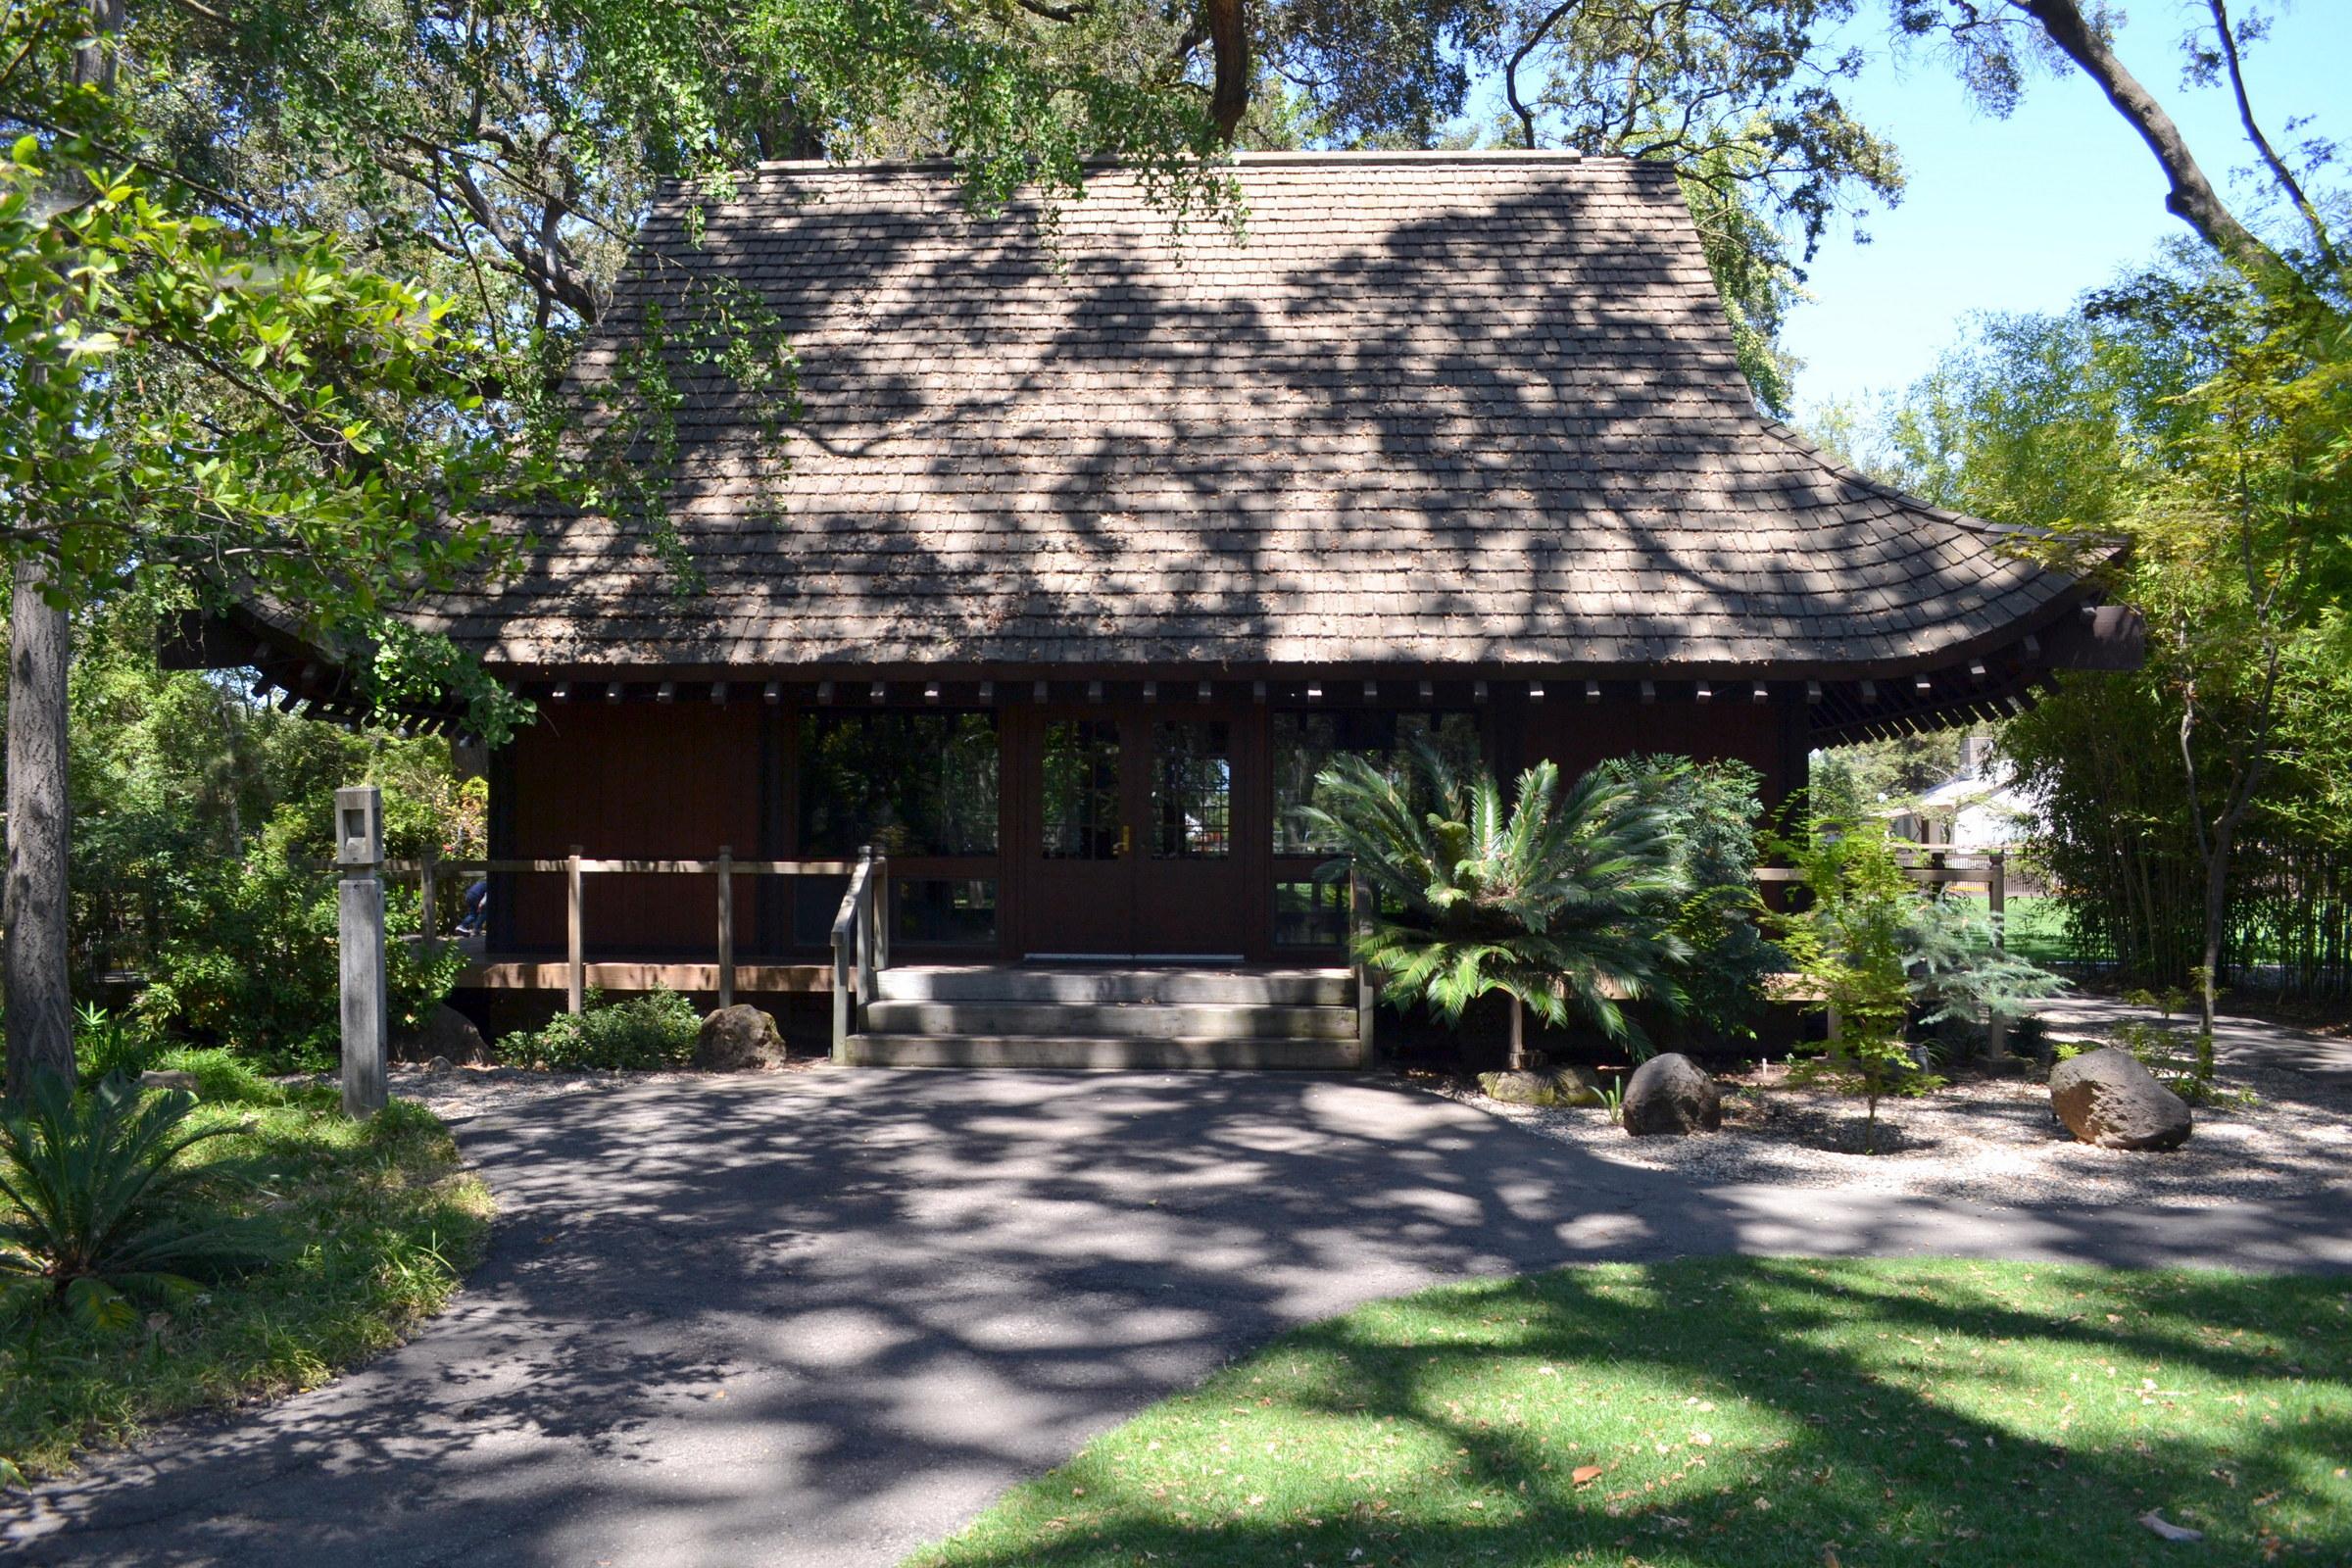 Anese Garden In Micke Grove Regional Park 2 Jpg